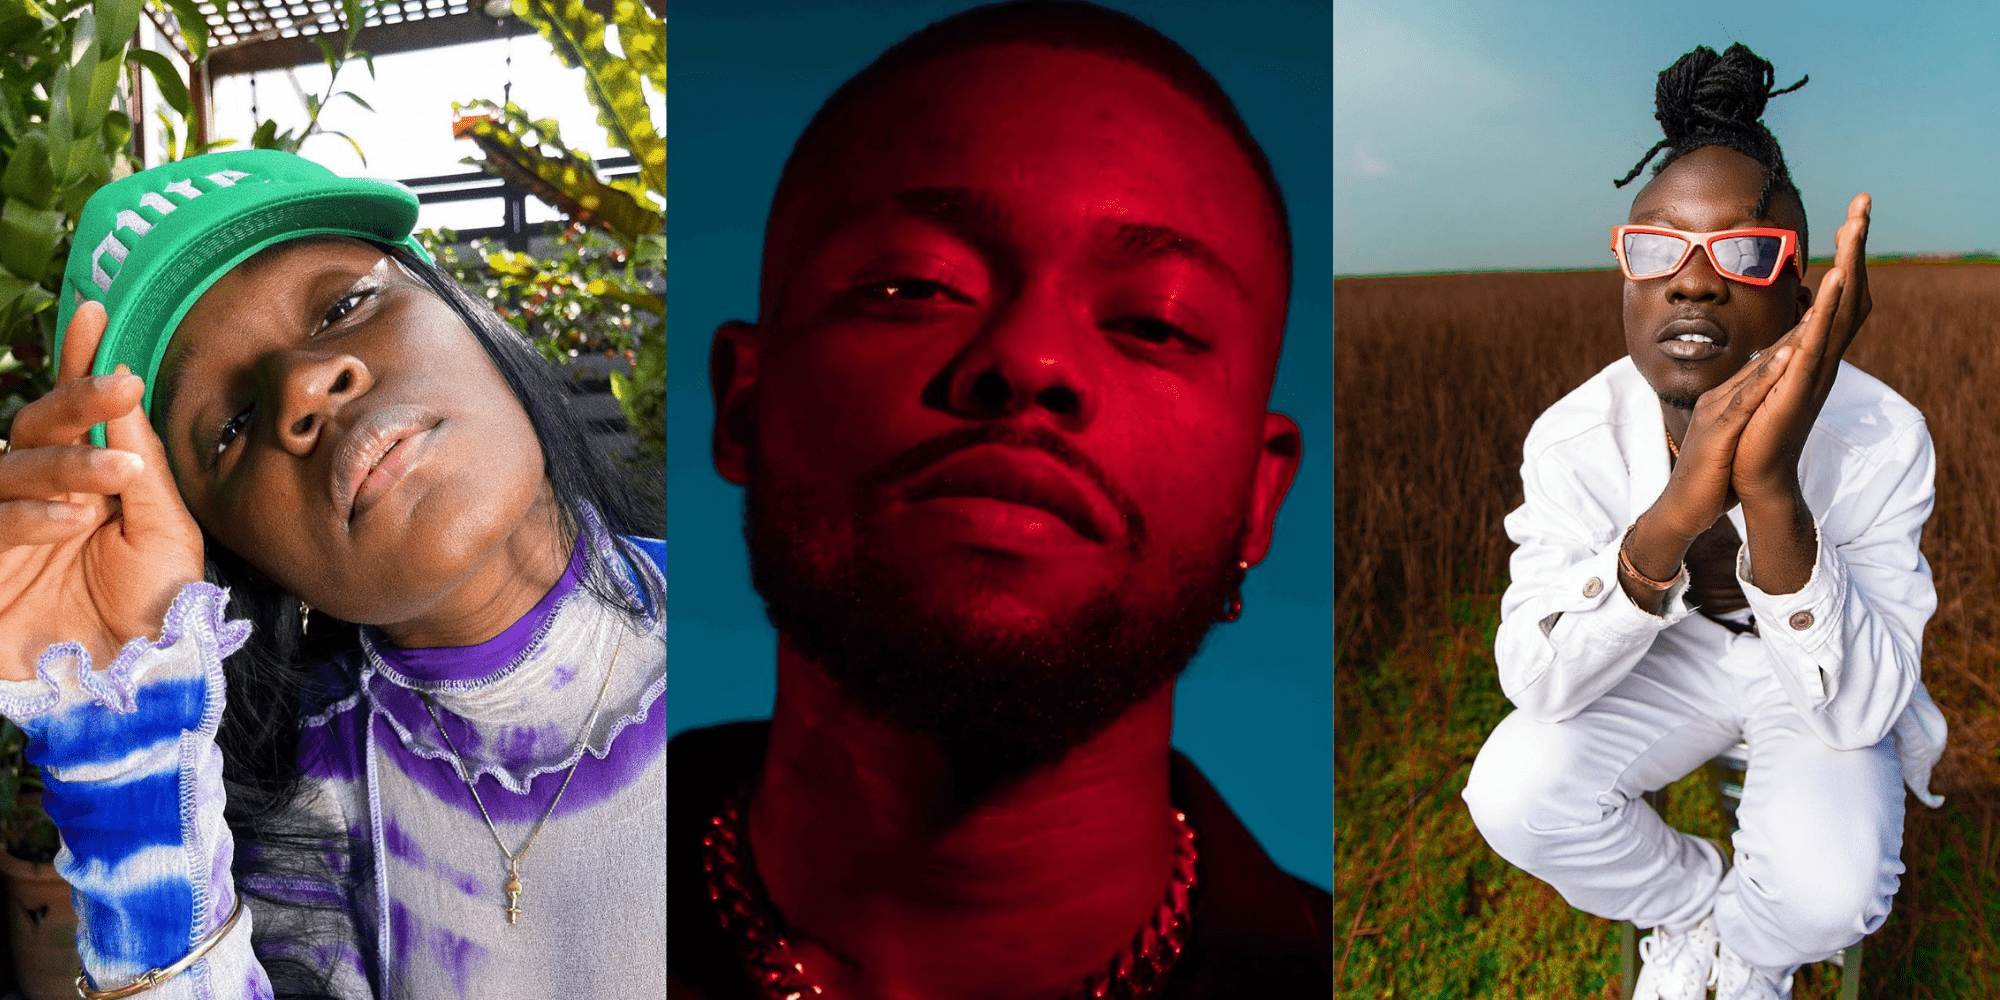 Songs Of The Day: New Music from Amaarae, Lojay, Kofi Jamar & More